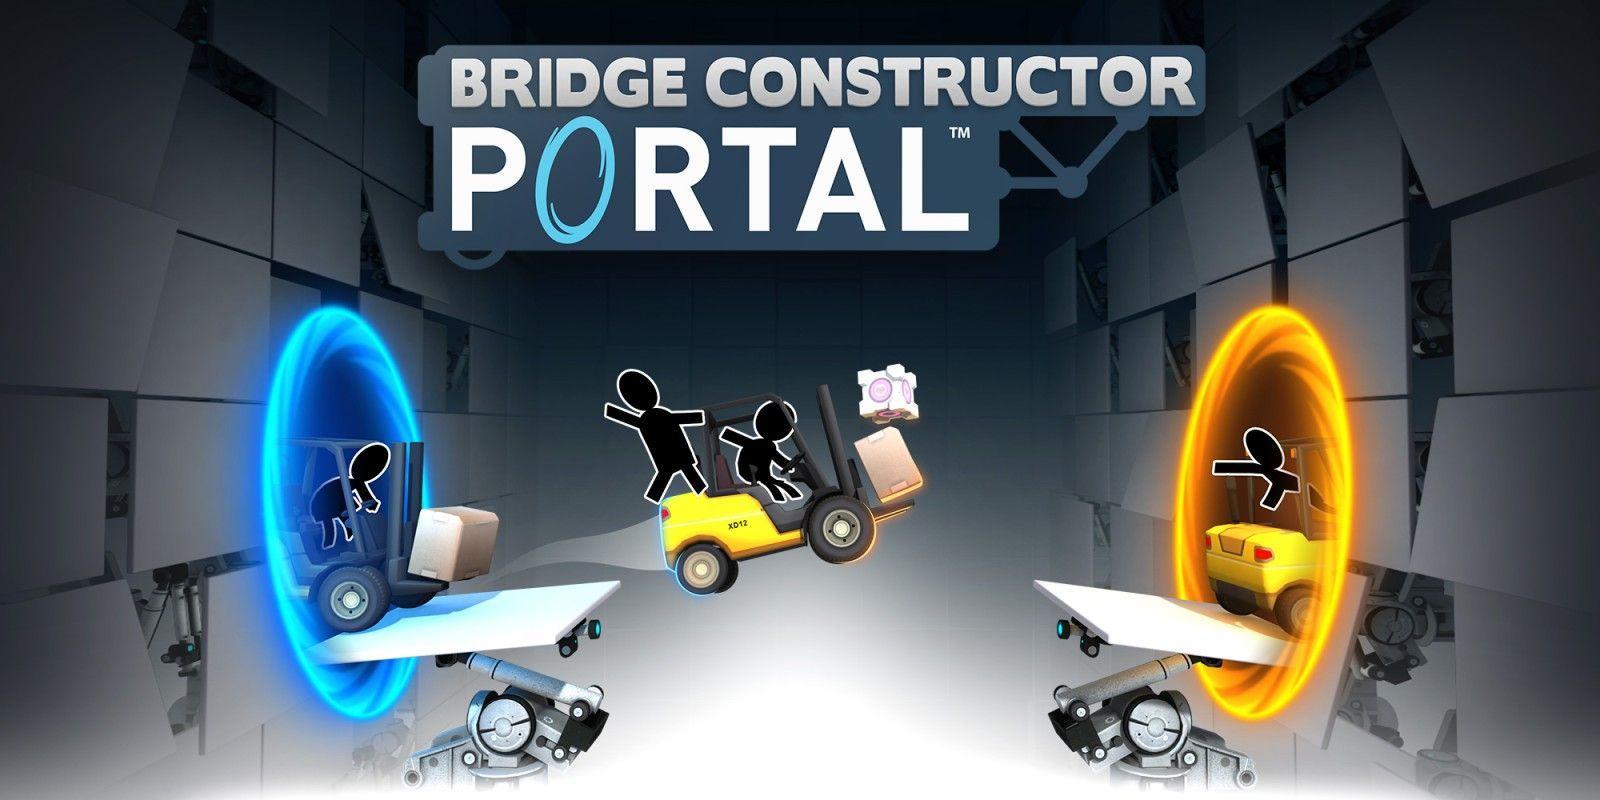 Nintendo Switch Sale - Bridge Constructor Portal £8.90 / Rocket League £11.25